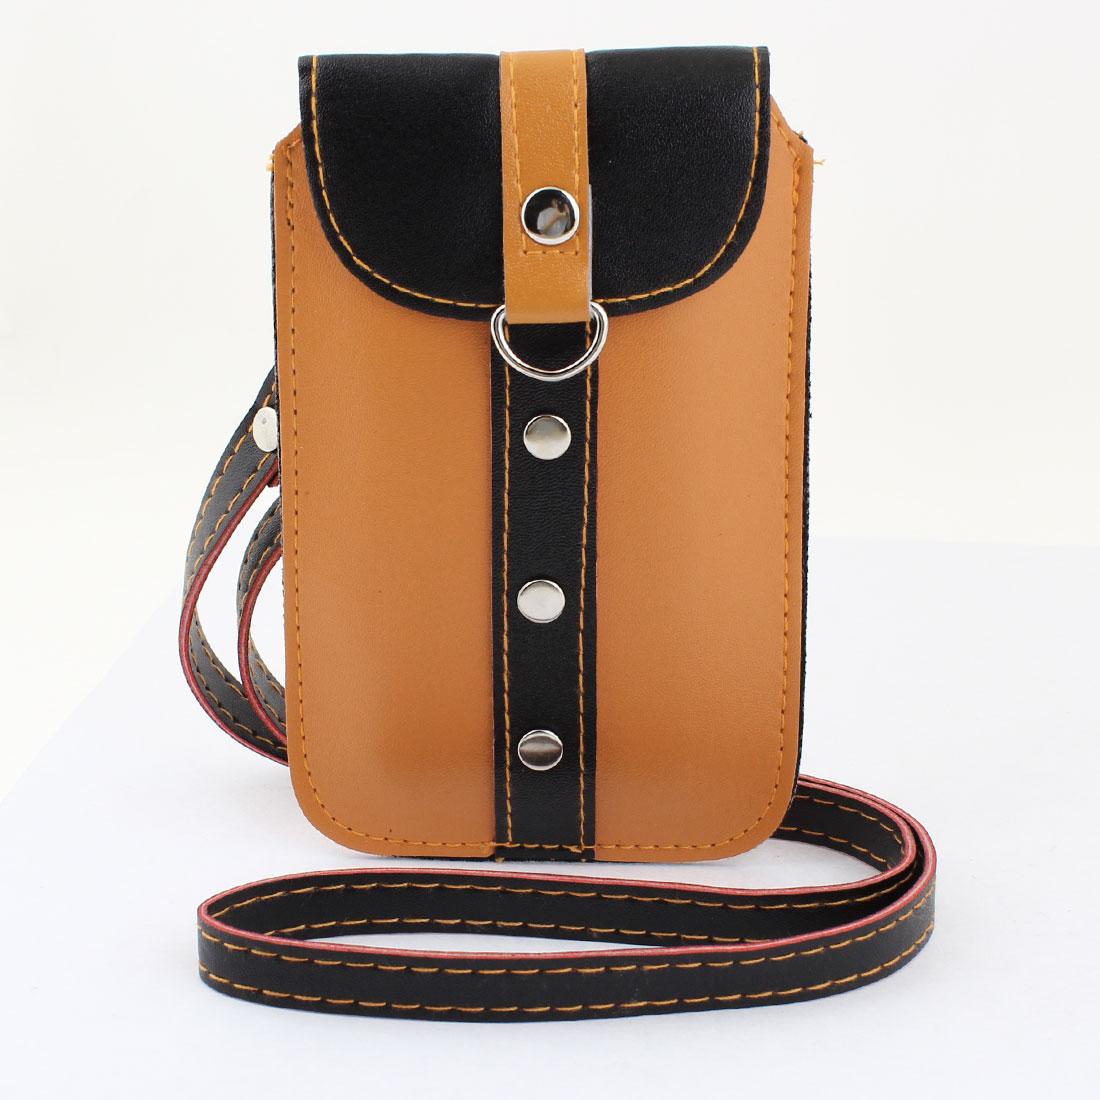 Portable Wrist Strap Sleeve Cover Fleece Lining Black Orange Cell Phone Holder